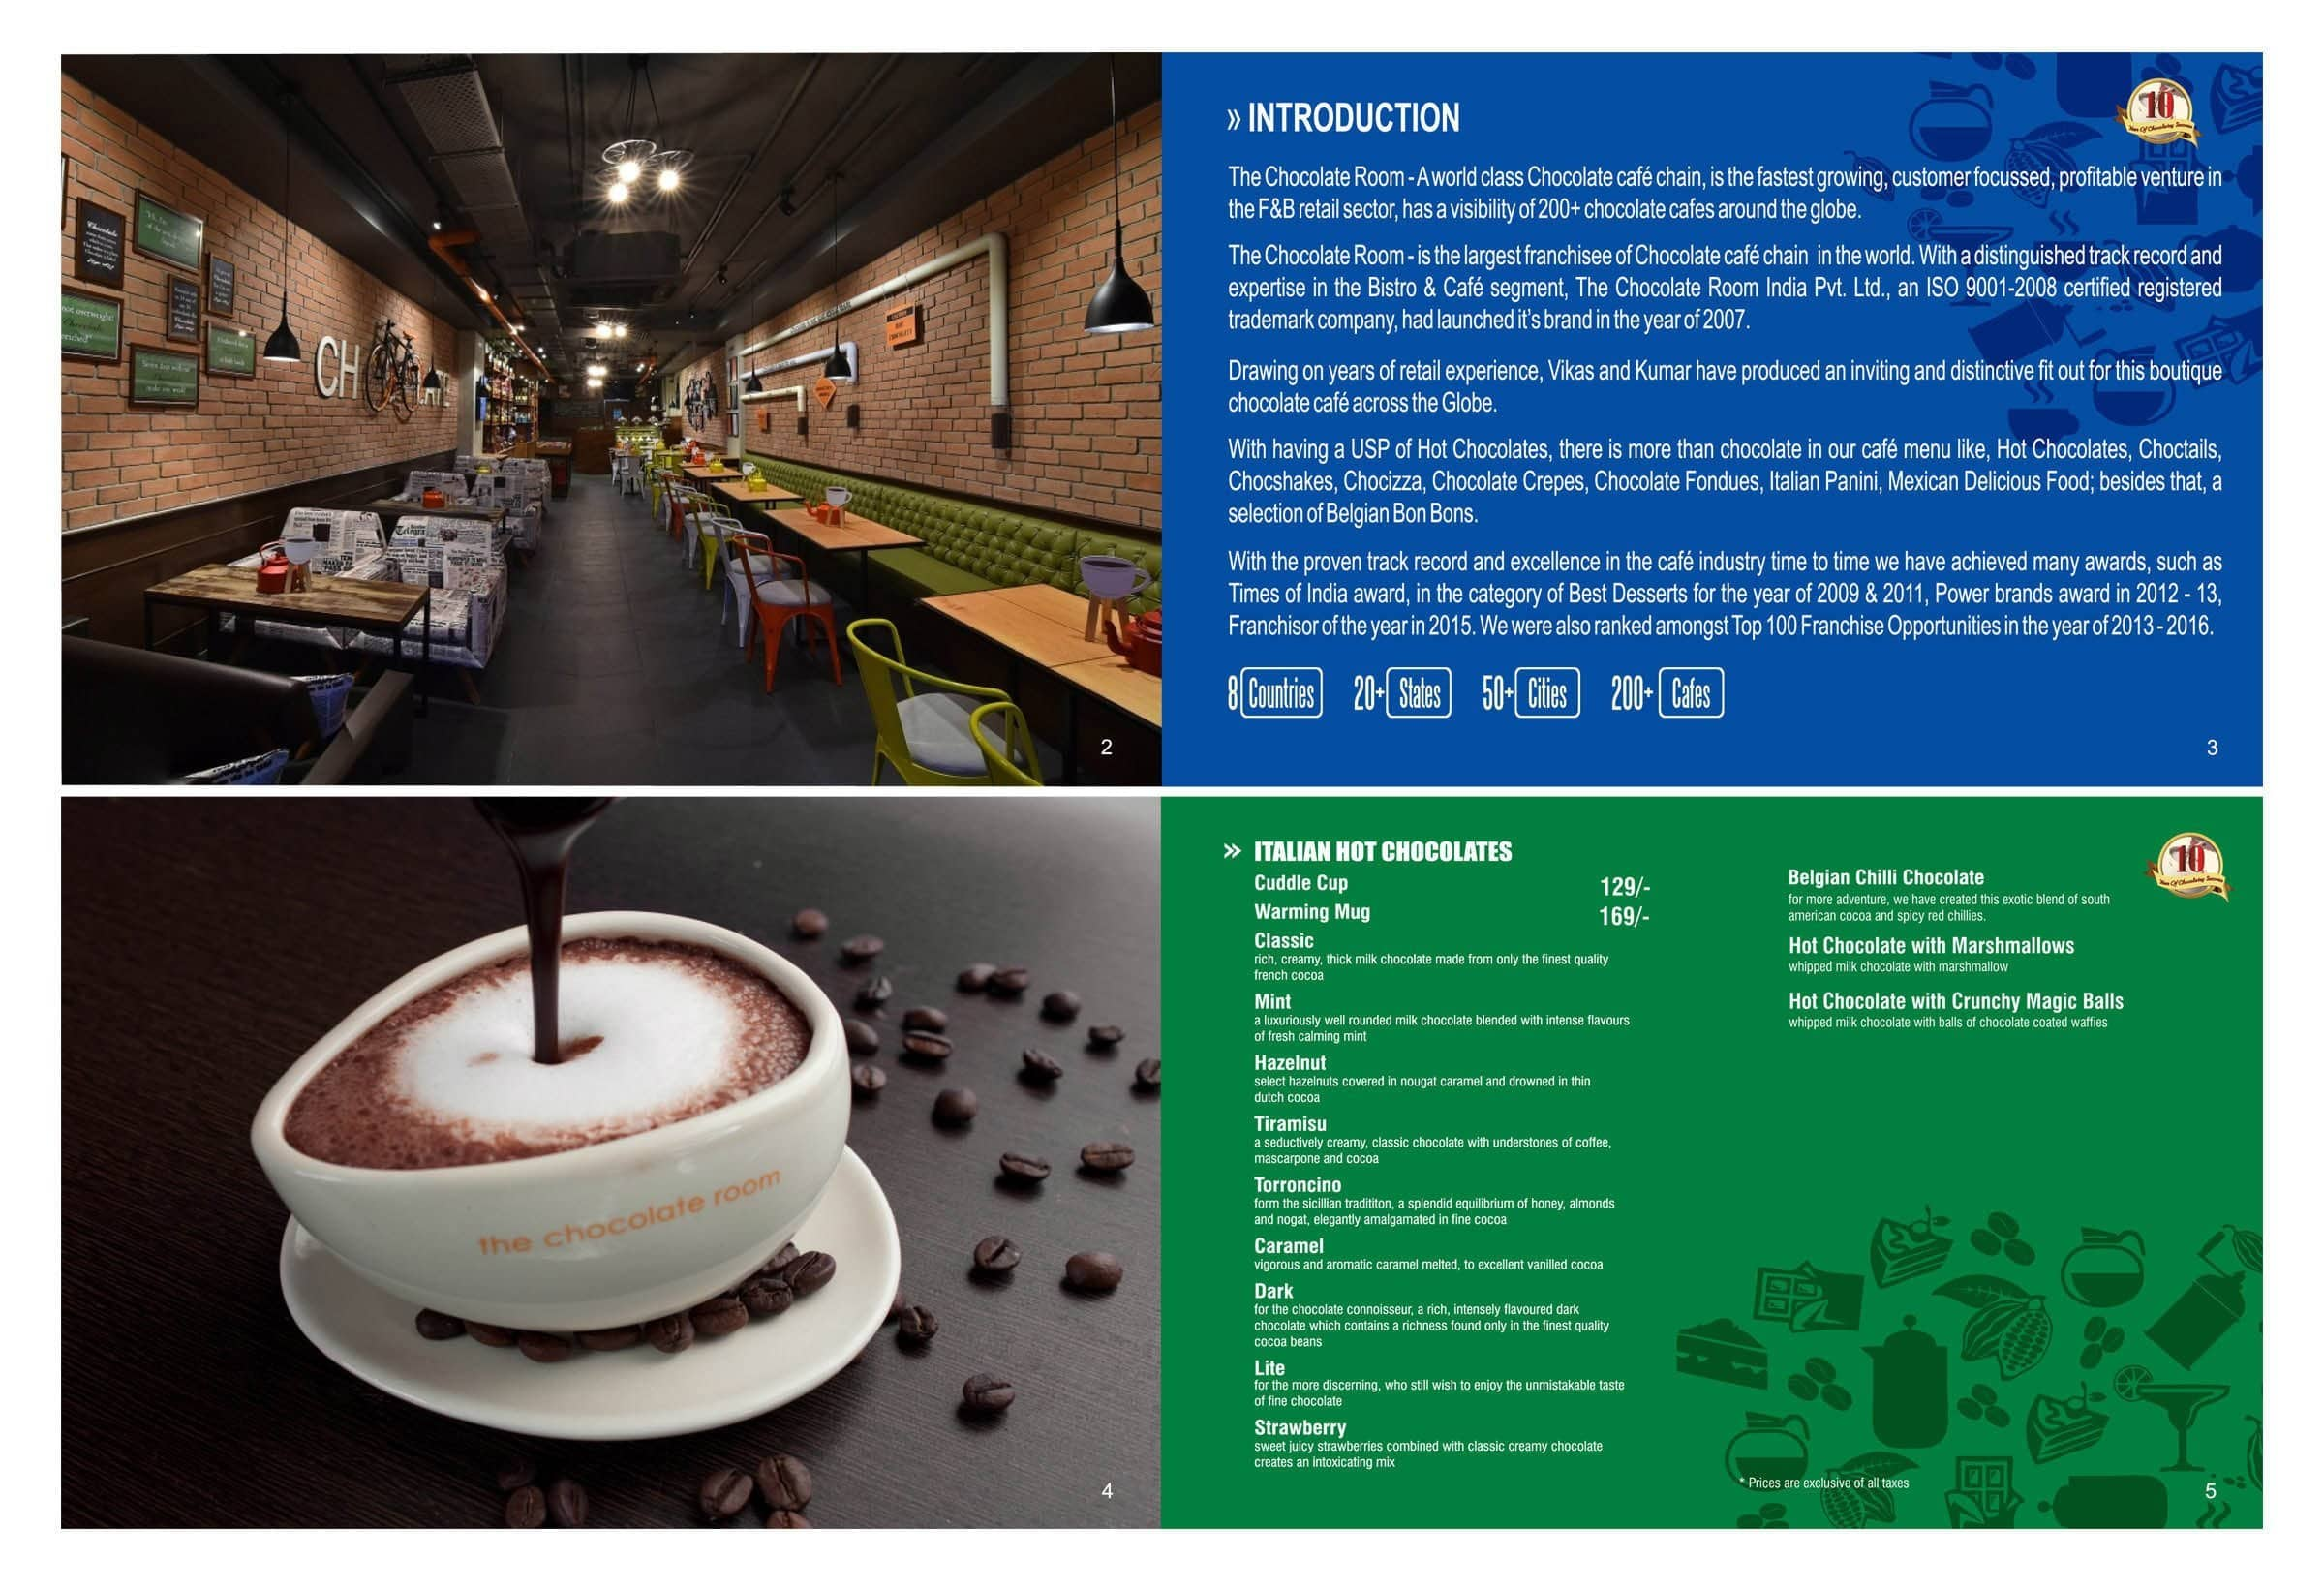 The Chocolate Room Menu, Menu for The Chocolate Room, RS Puram ...